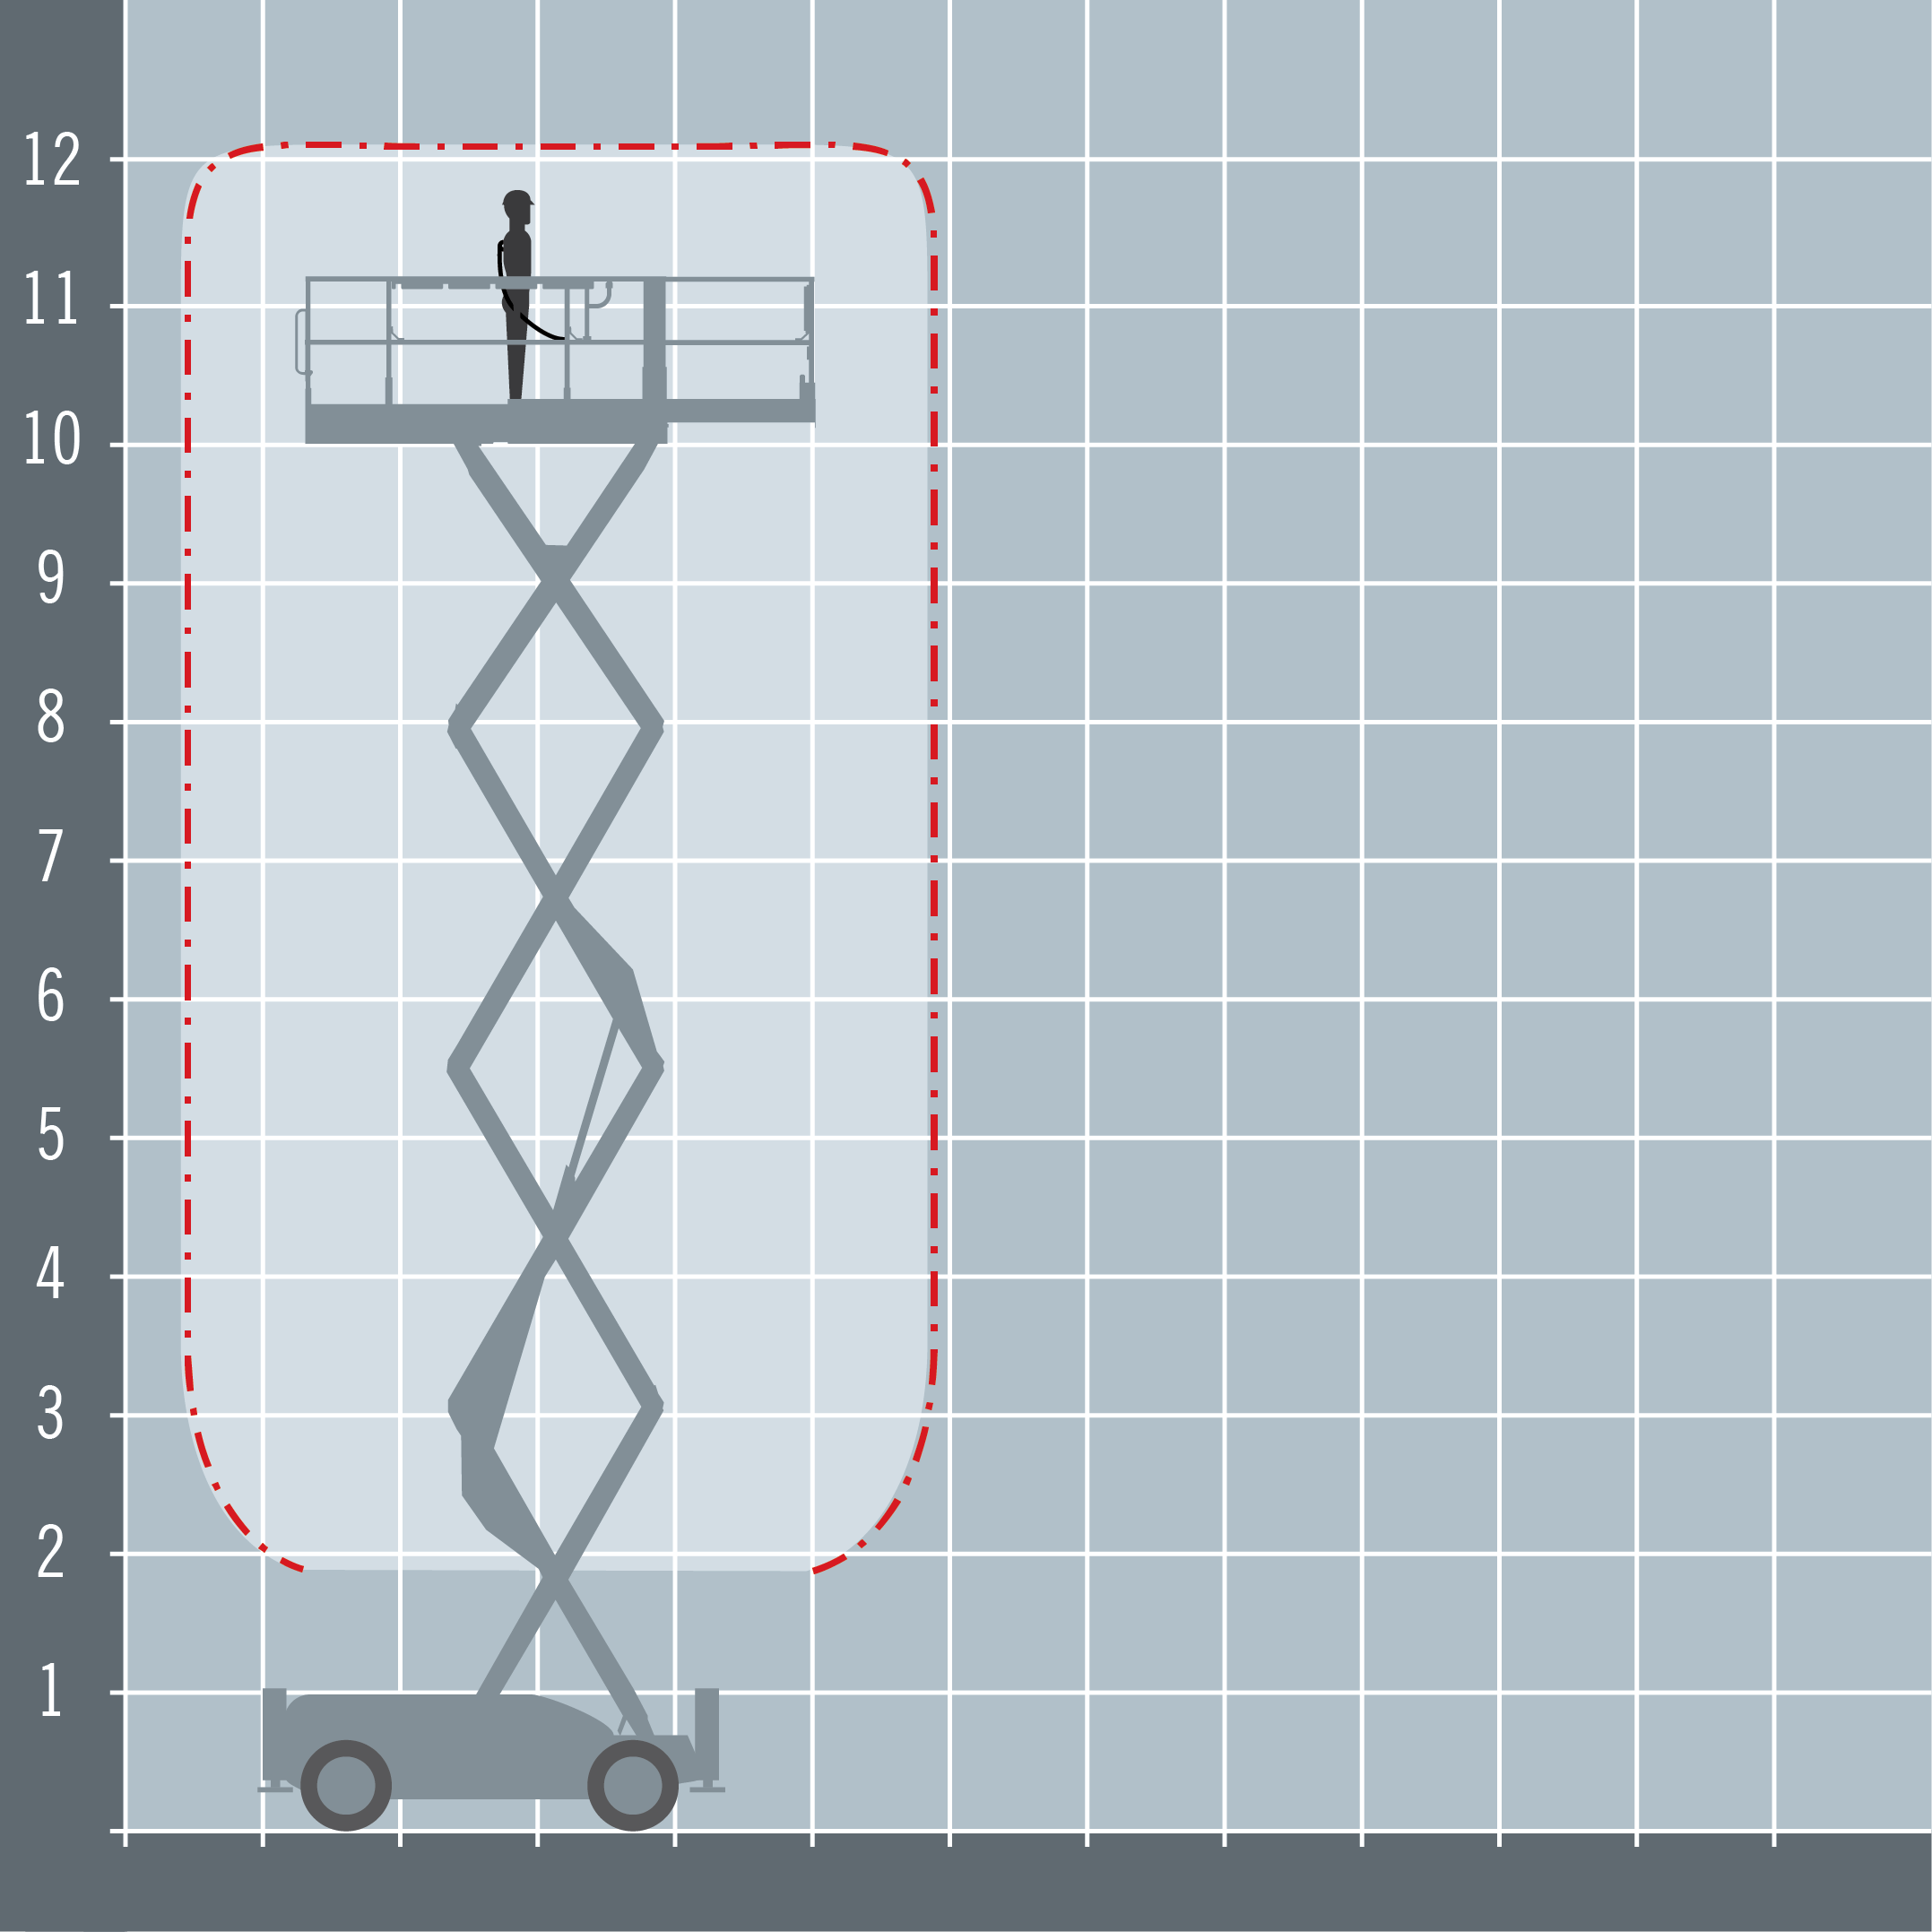 Haulotte COM 12DX diagram